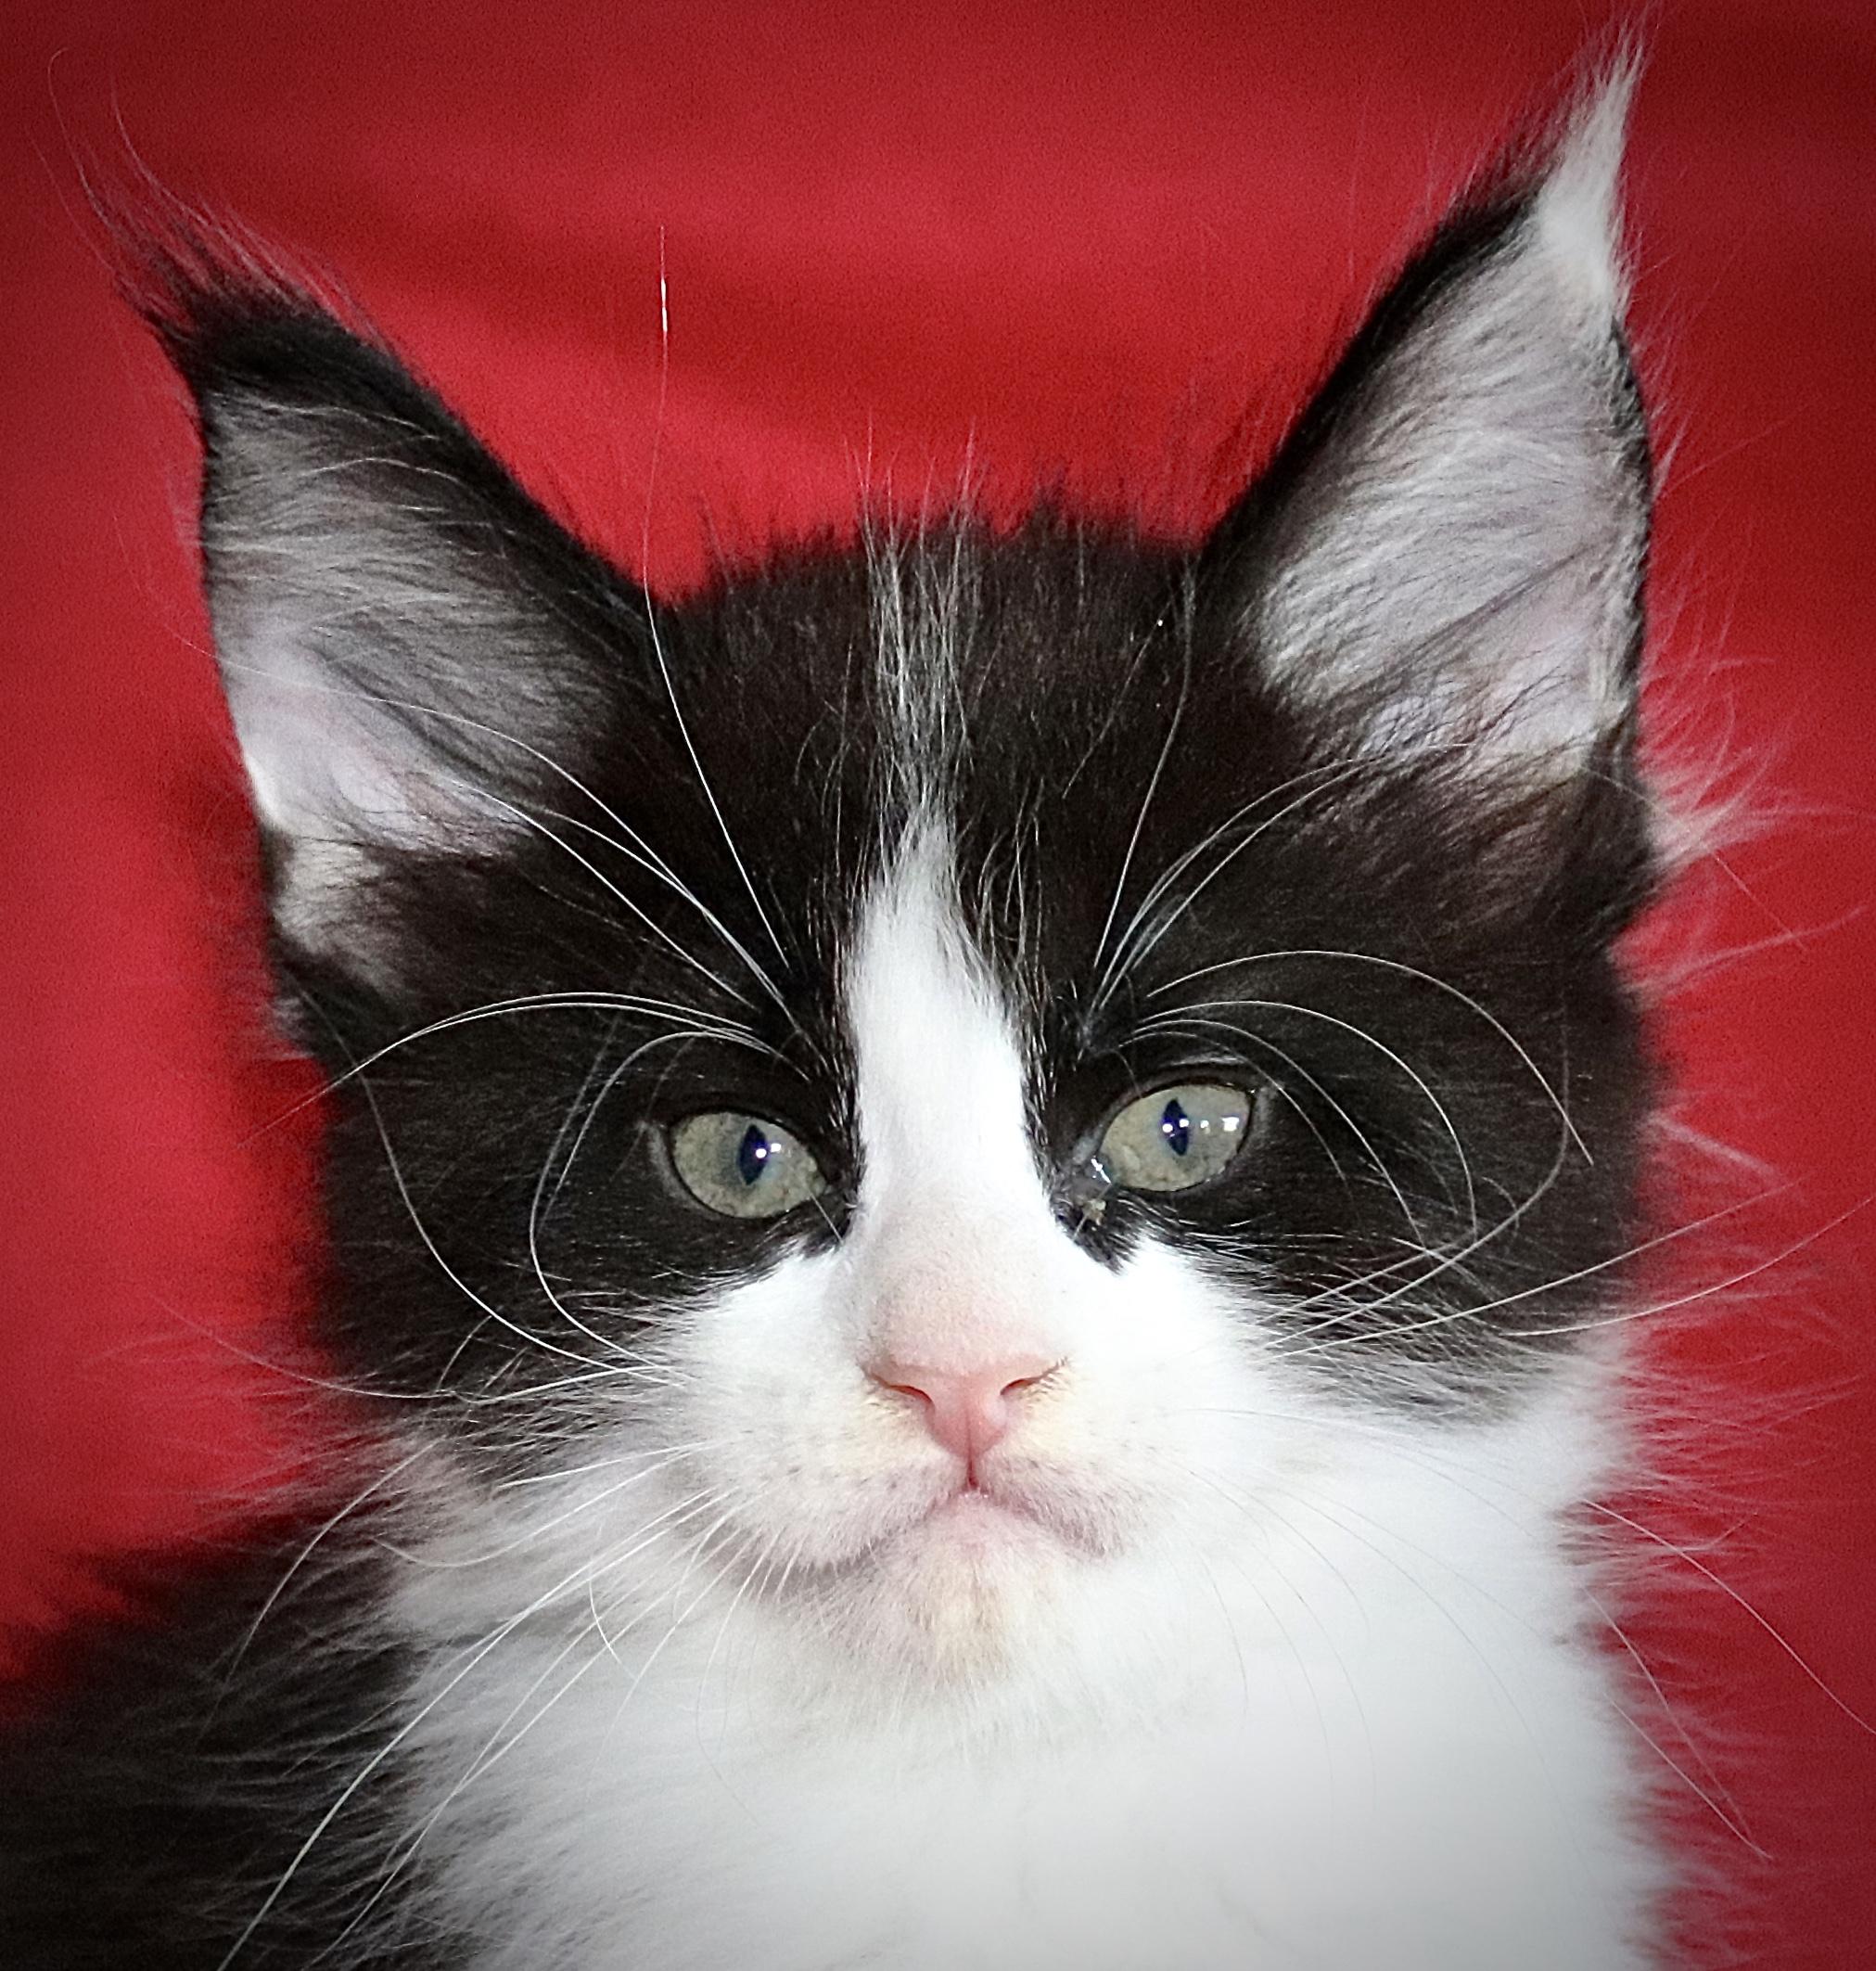 kočka VRH I: INDIANA UNO VON ERILLIAN*CZ